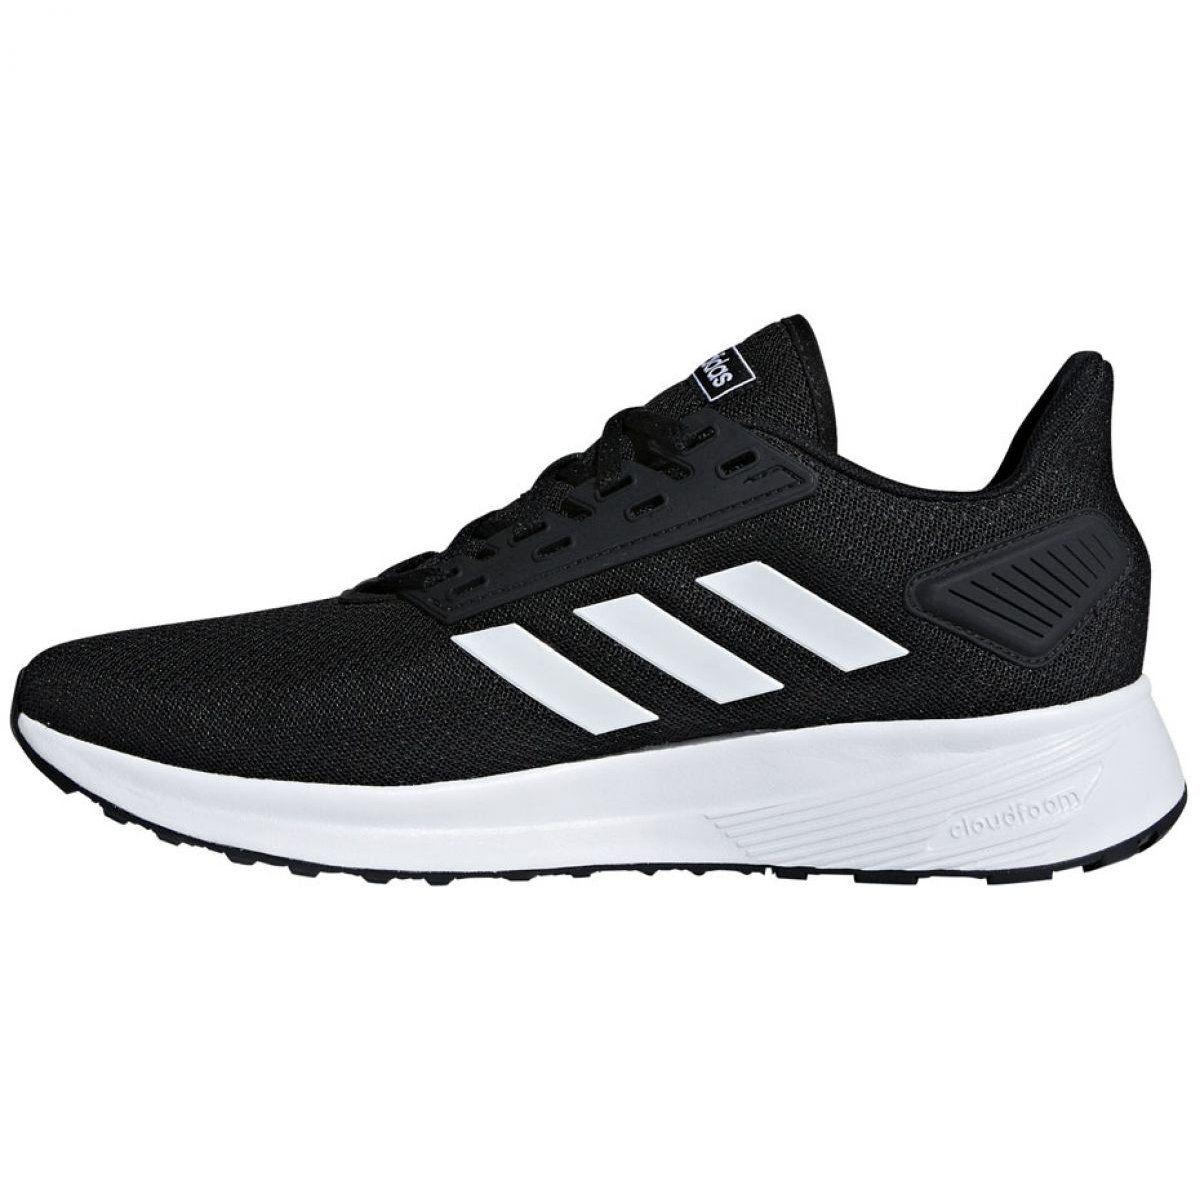 Running Shoes Adidas Duramo 9 M Bb7066 Black Adidas Running Shoes Adidas Shoes Running Shoes